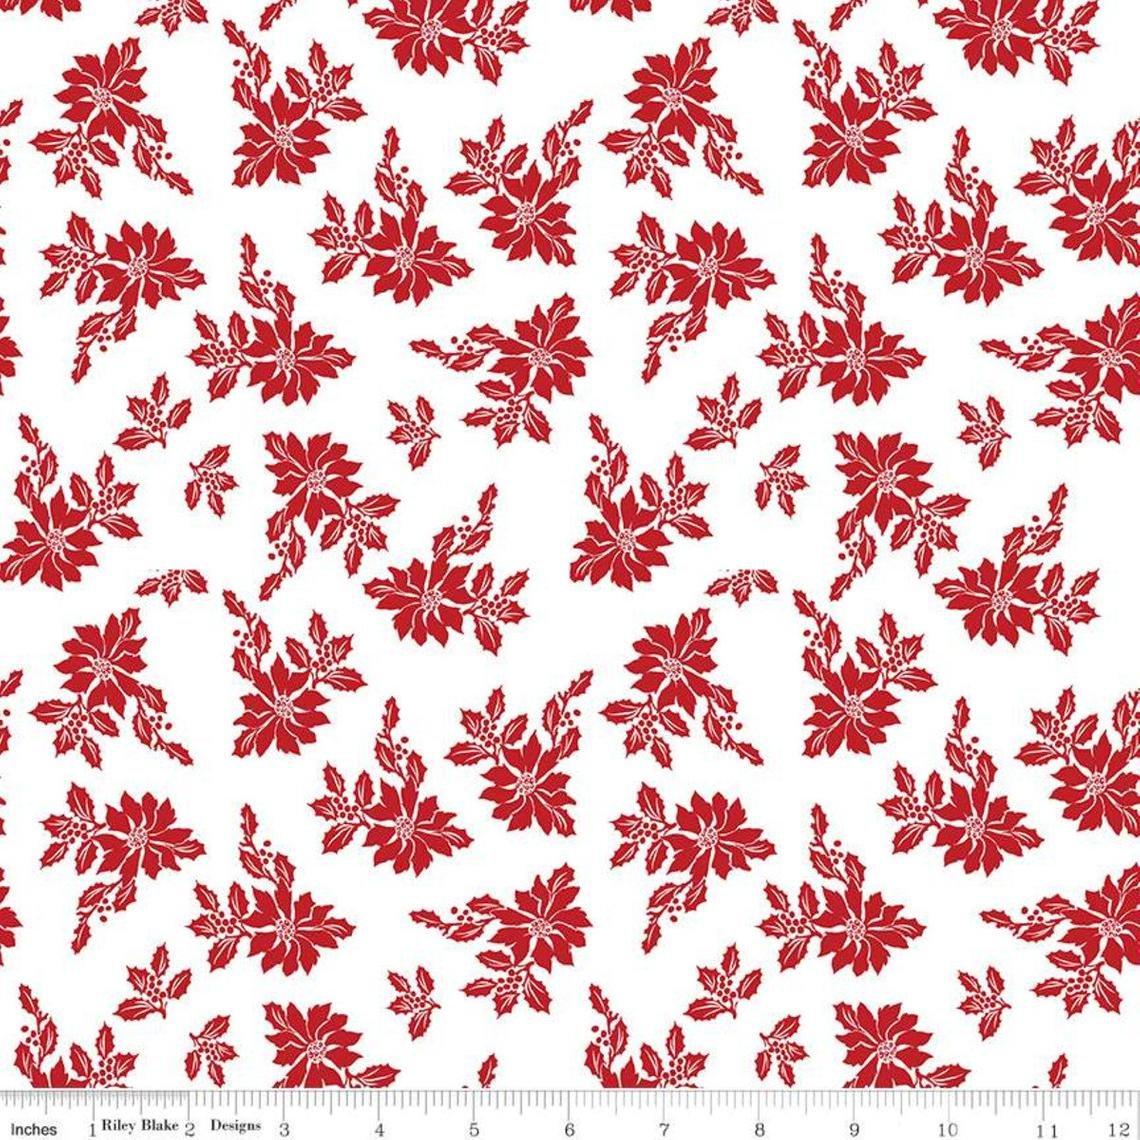 Exclusive Fabrics for Fabric Fan Club Members - November